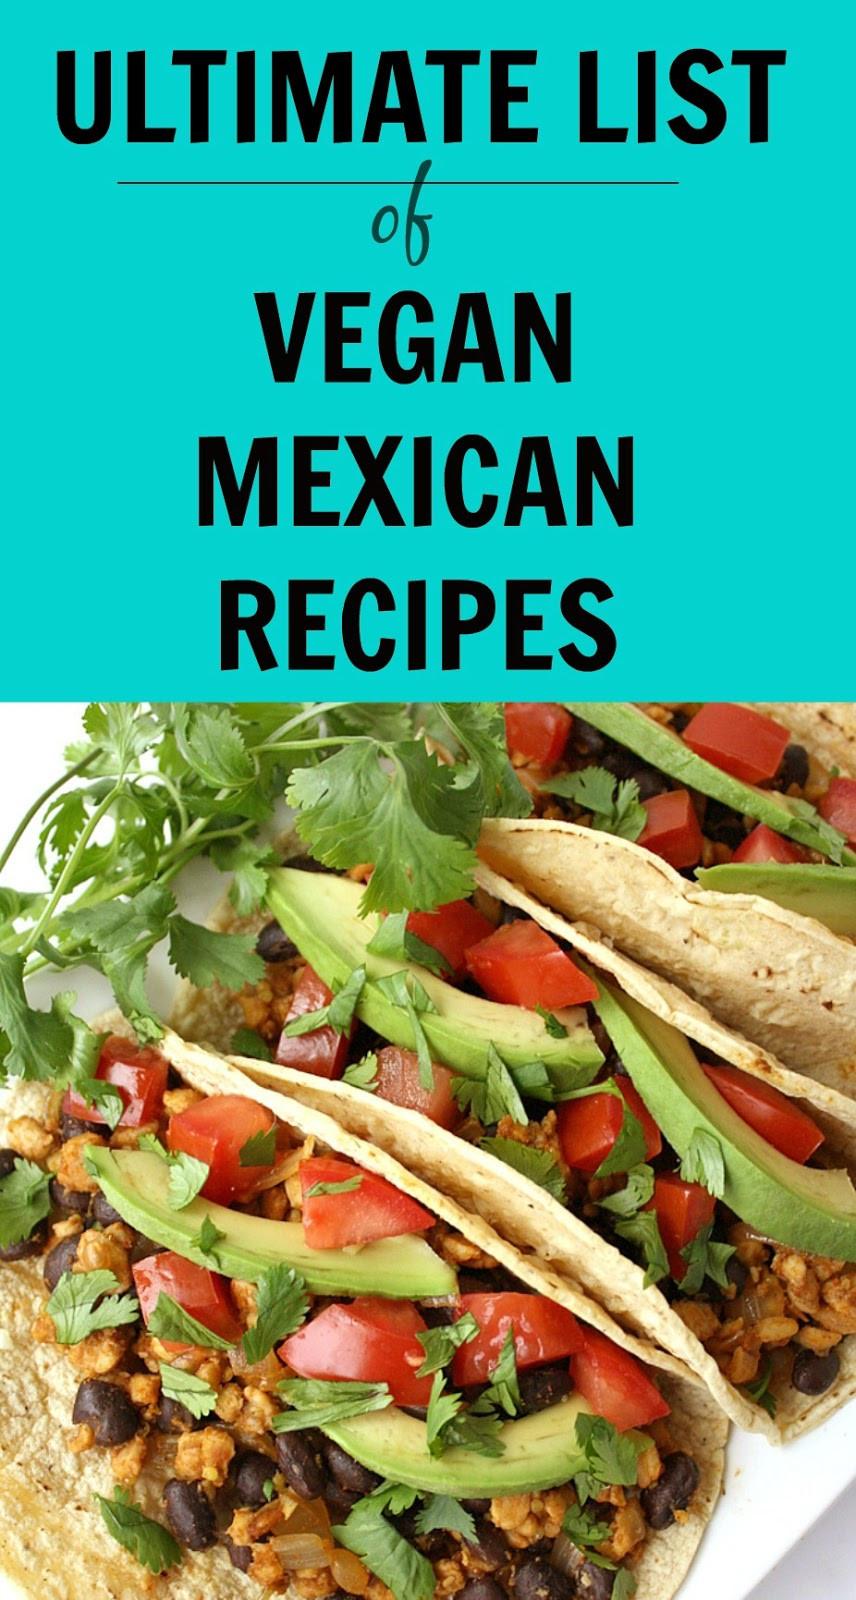 Vegan Mexican Recipes  The Garden Grazer Ultimate List of Vegan Mexican Recipes